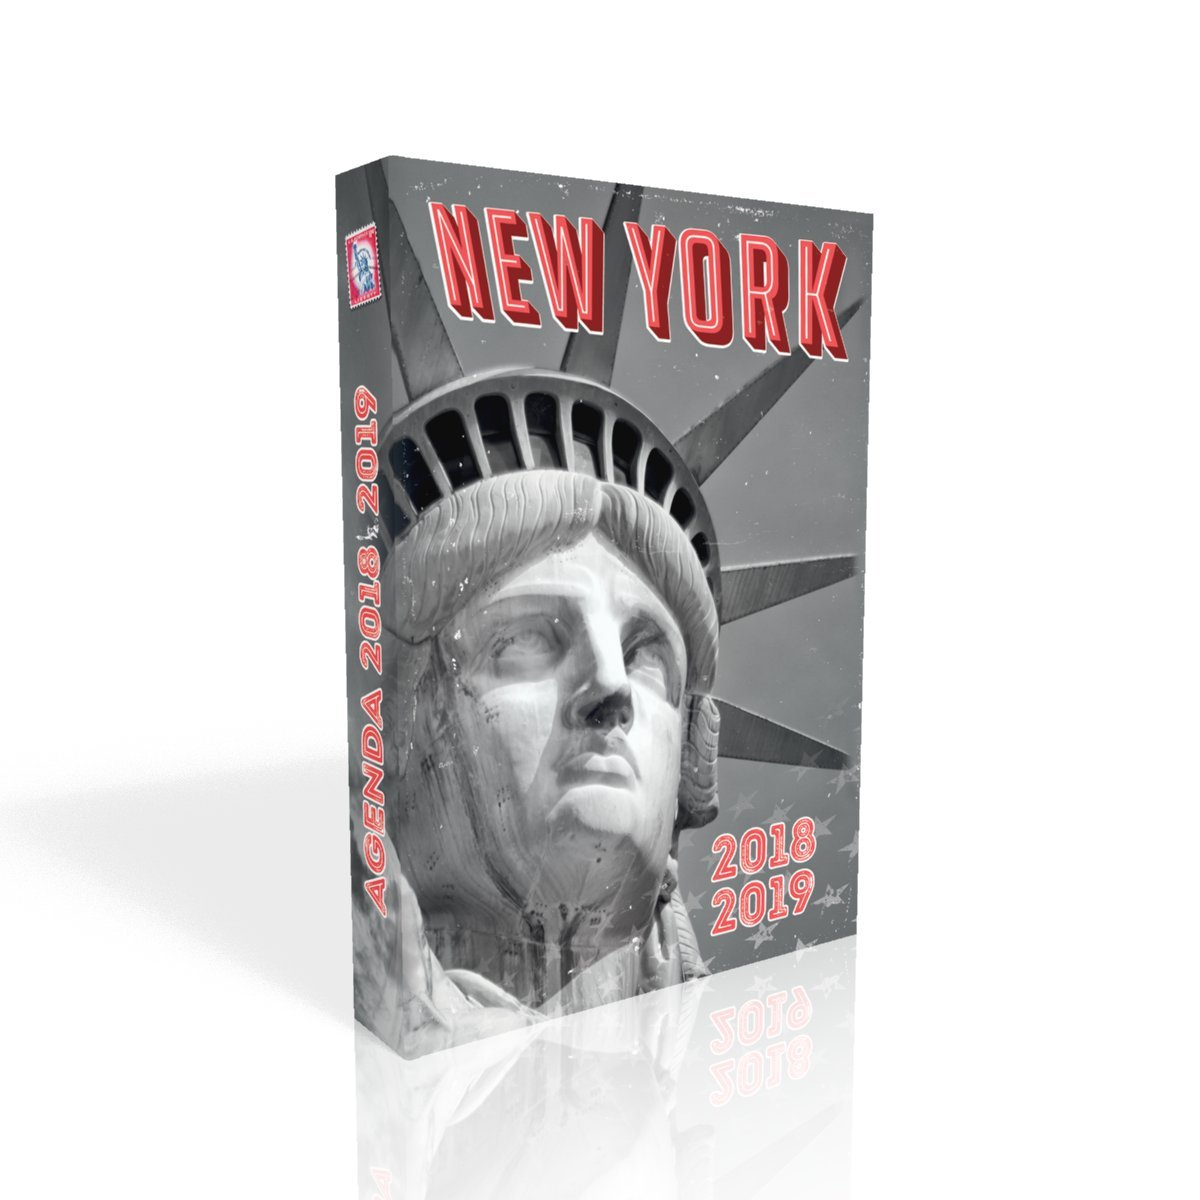 AGENDA SCOLAIRE 2018-2019 - NEW YORK POLYMARK